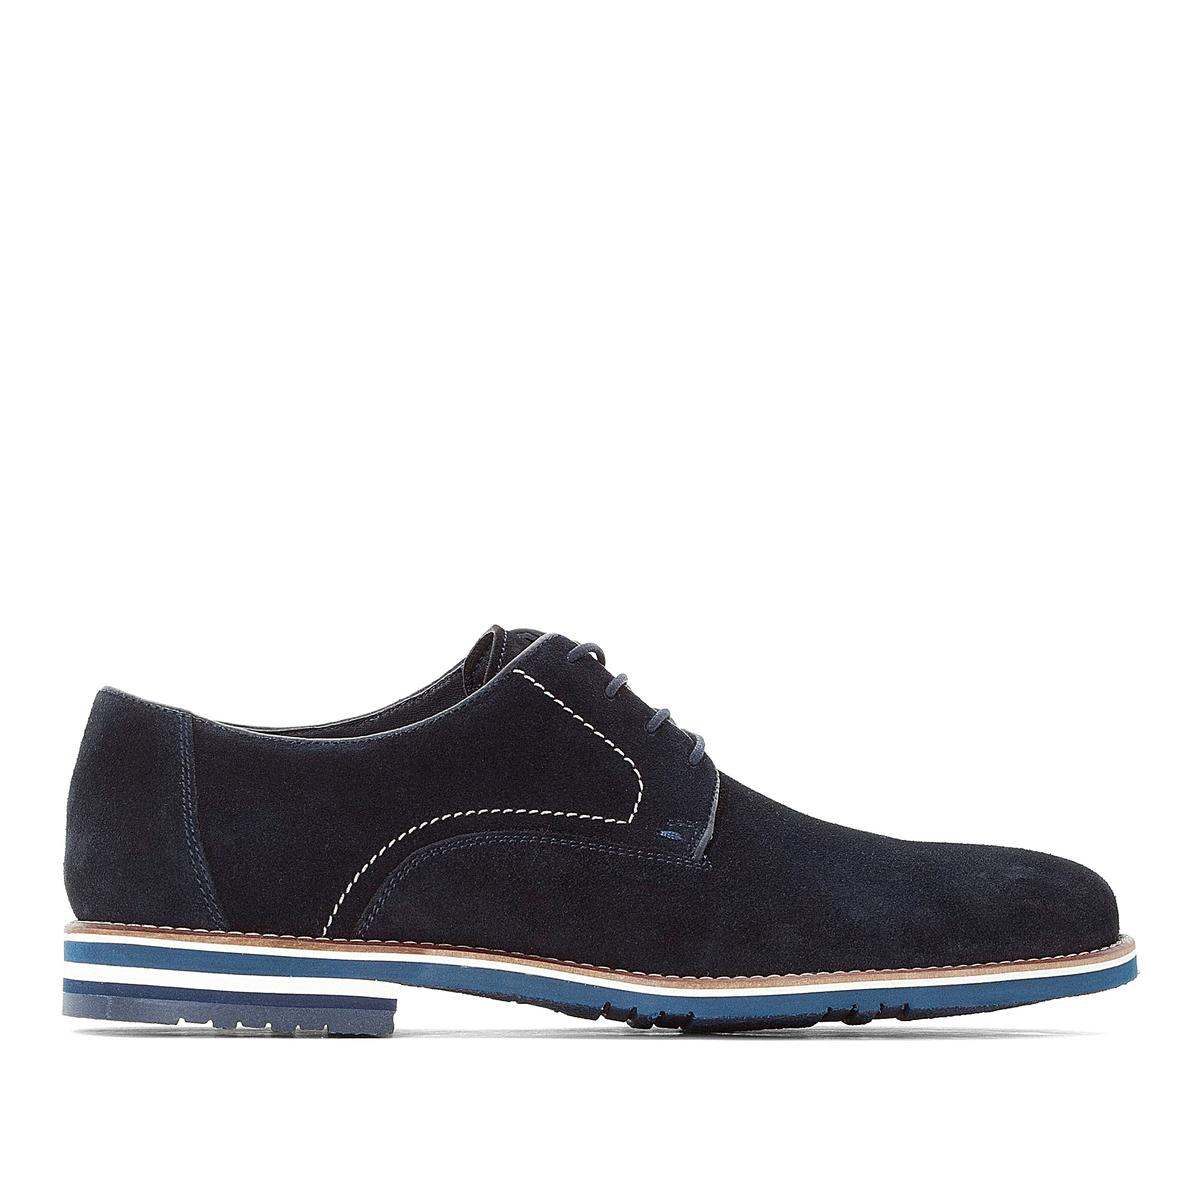 цена Ботинки-дерби La Redoute С двухцветной подошвой 39 синий онлайн в 2017 году